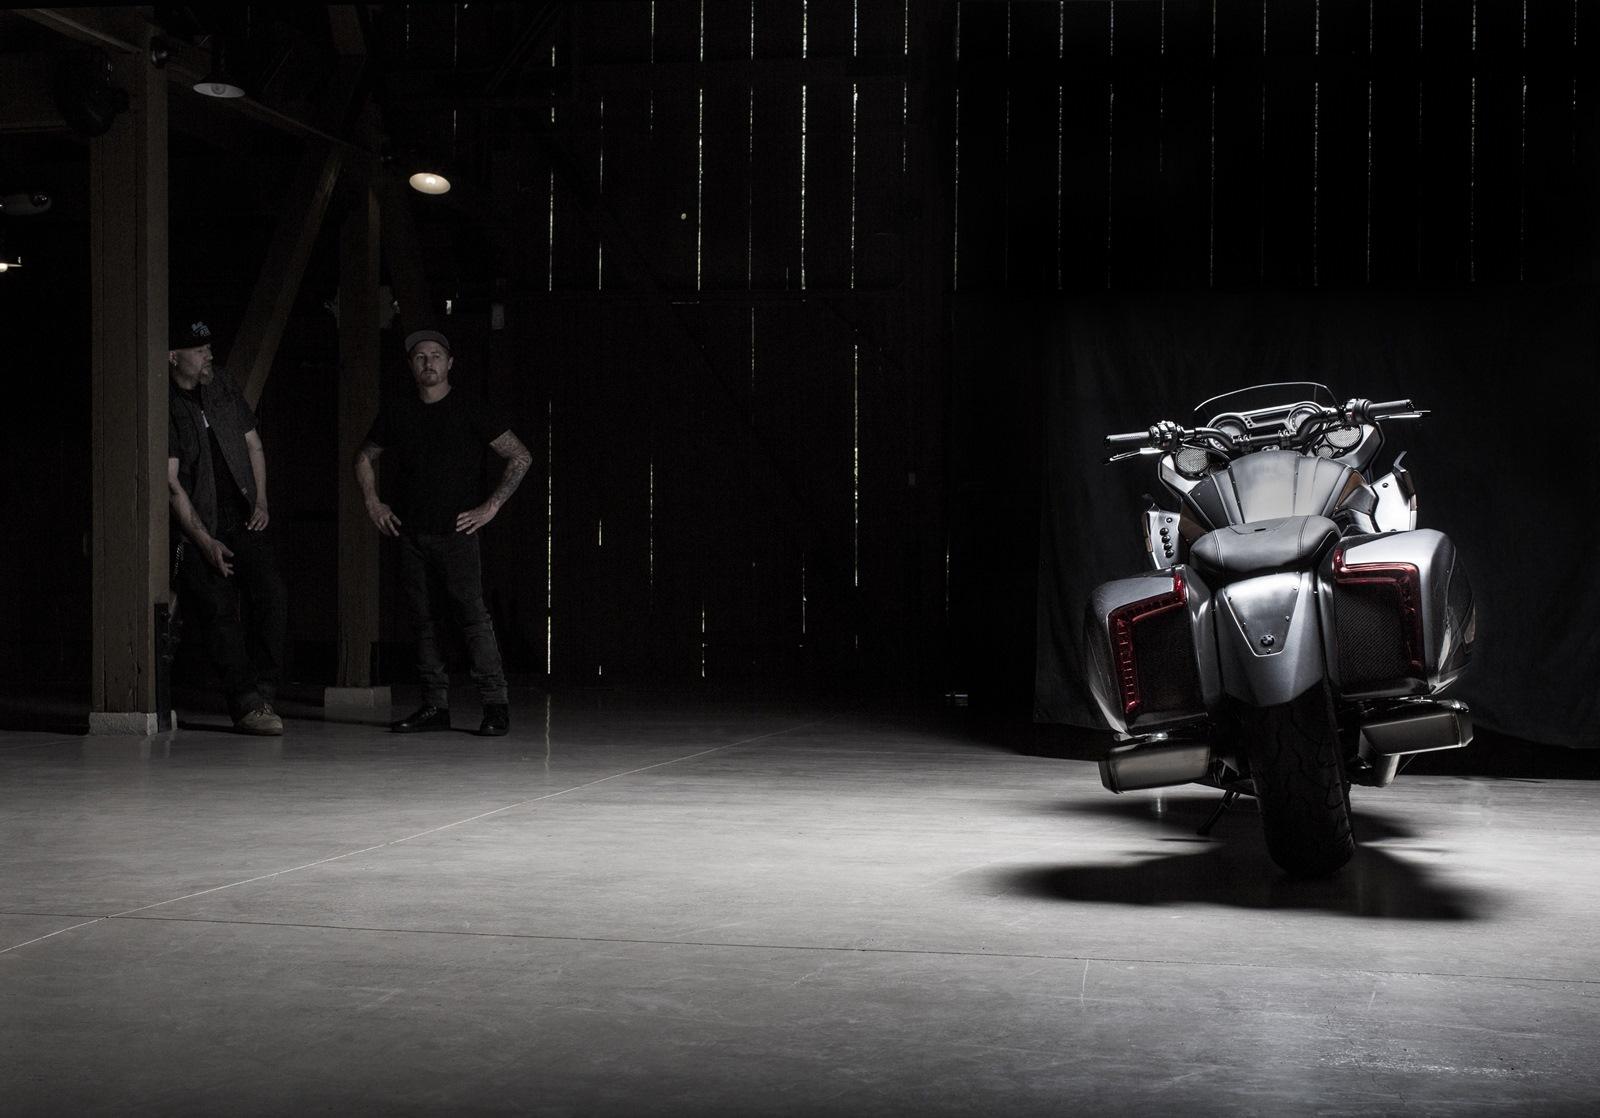 BMW Concept 101 Bagger